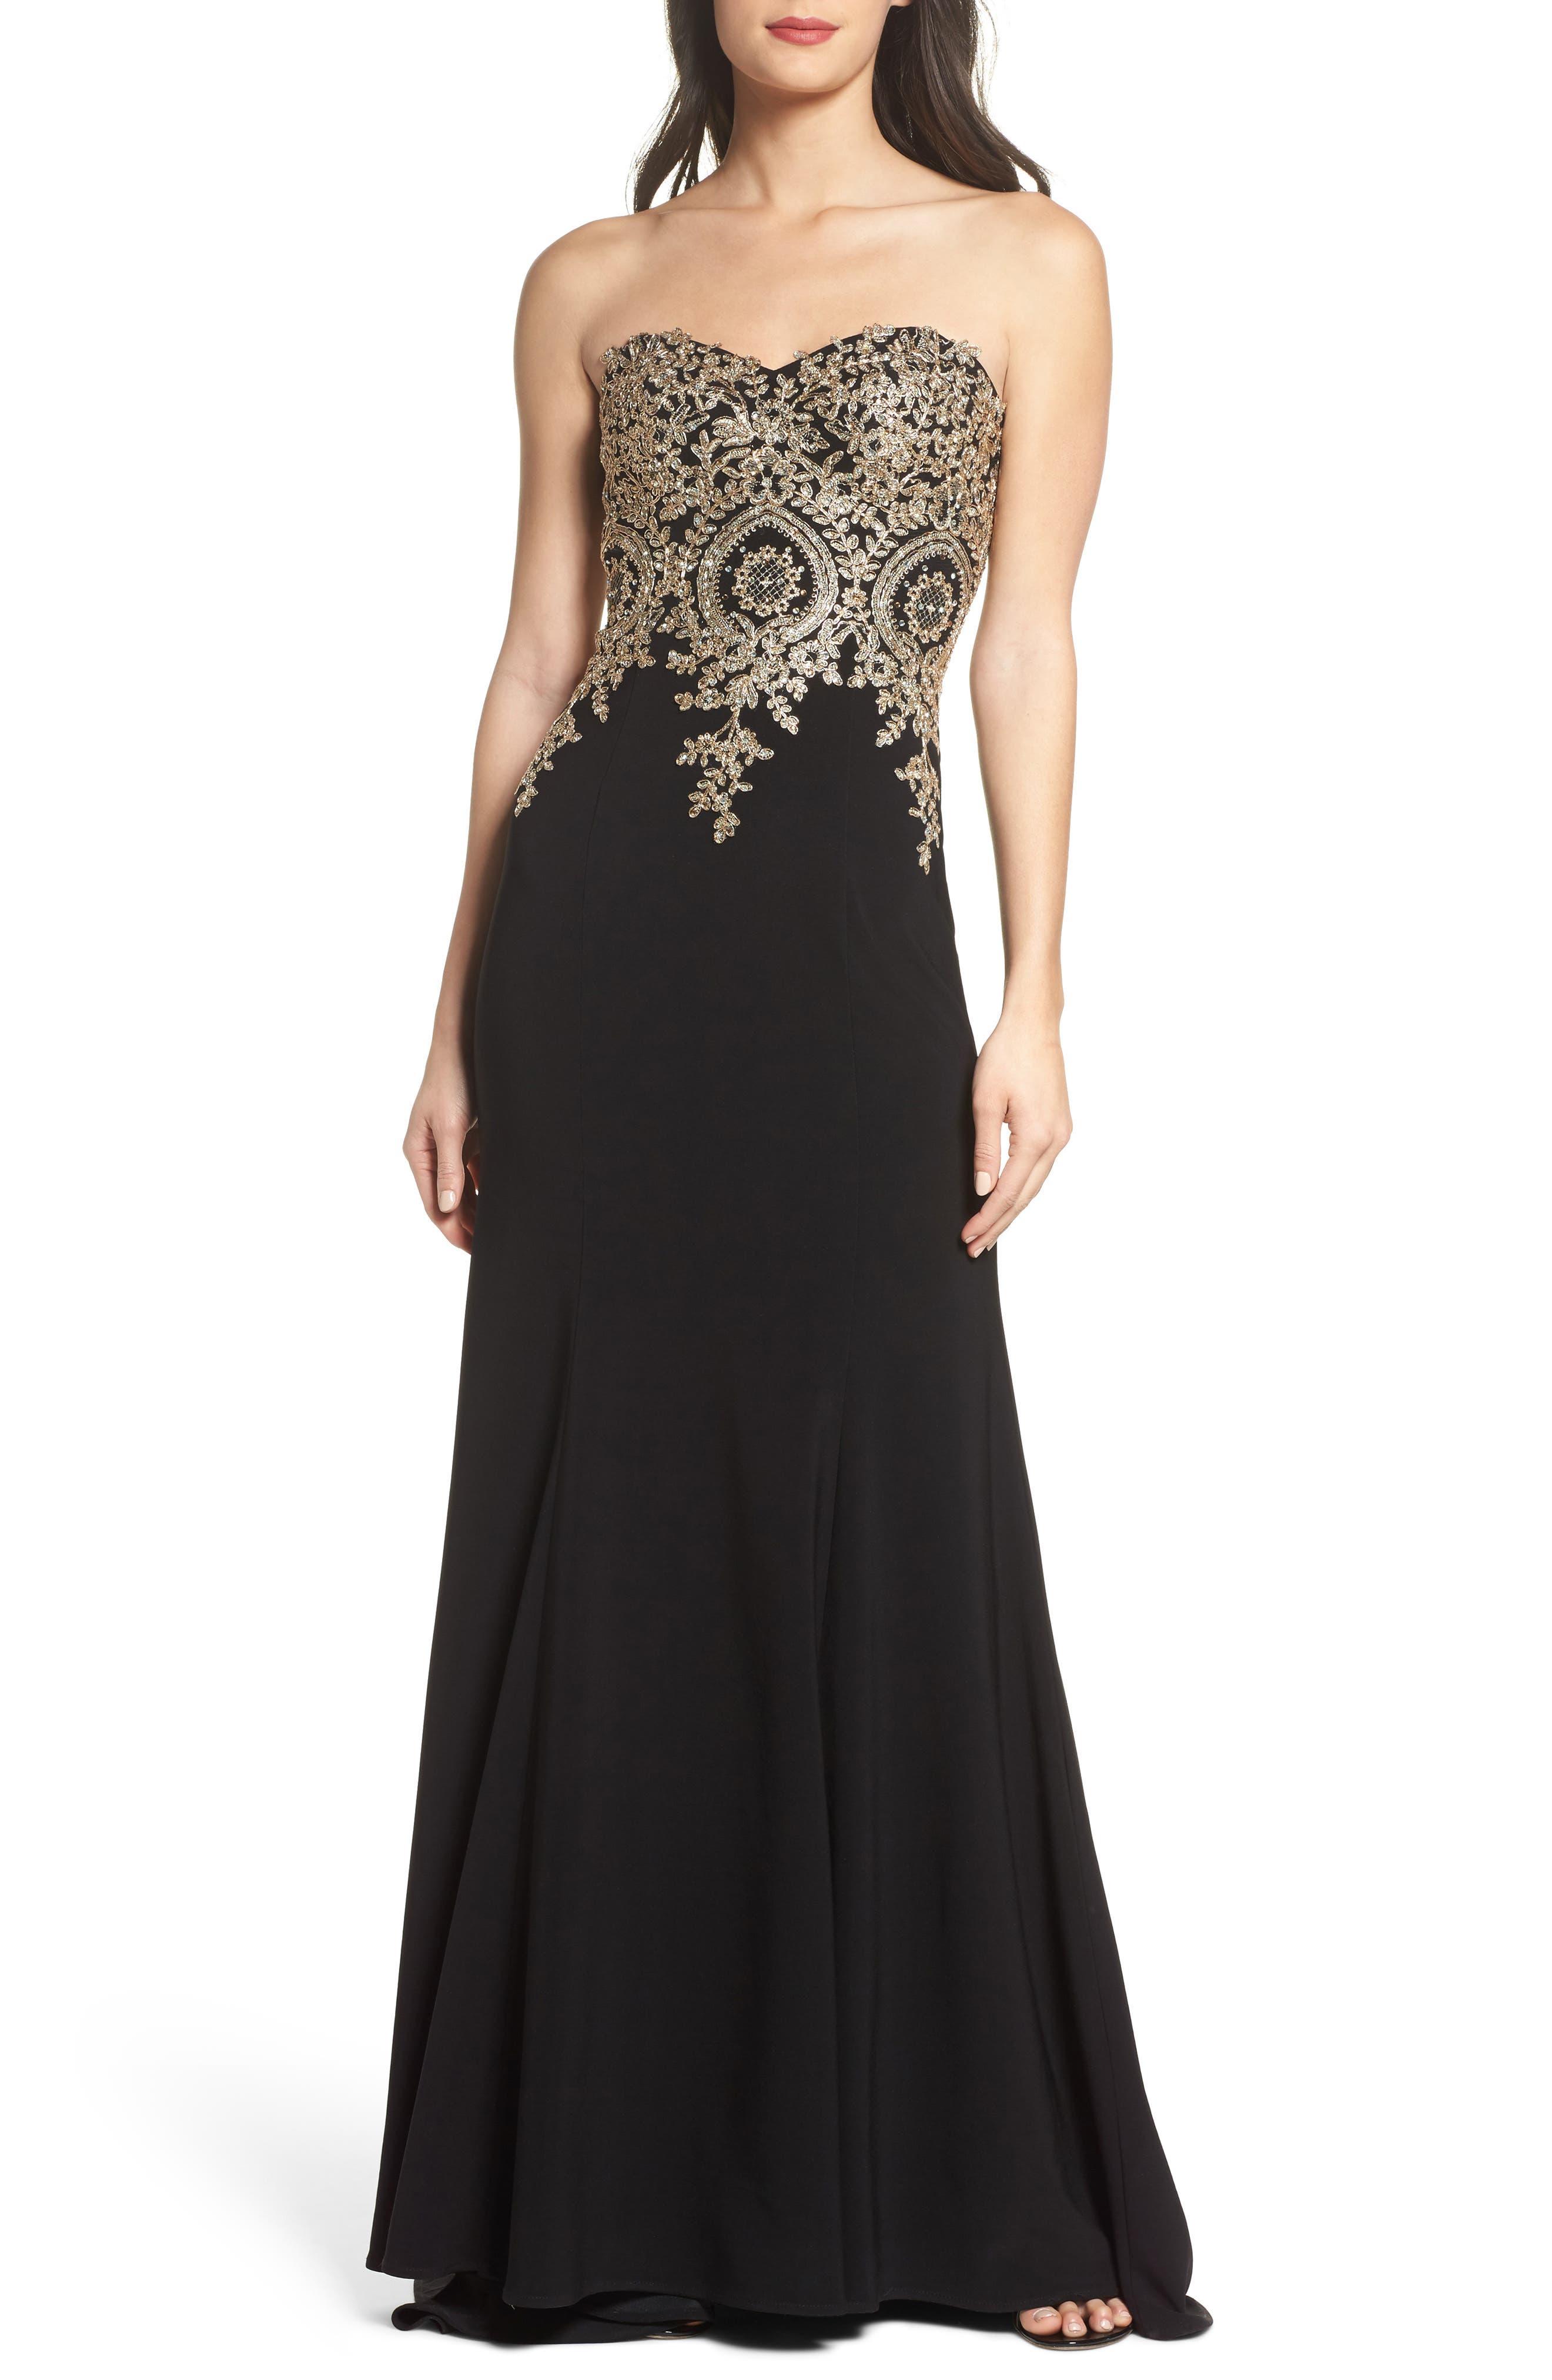 Corset Back Embellished Strapless Gown,                         Main,                         color, Black/ Gold